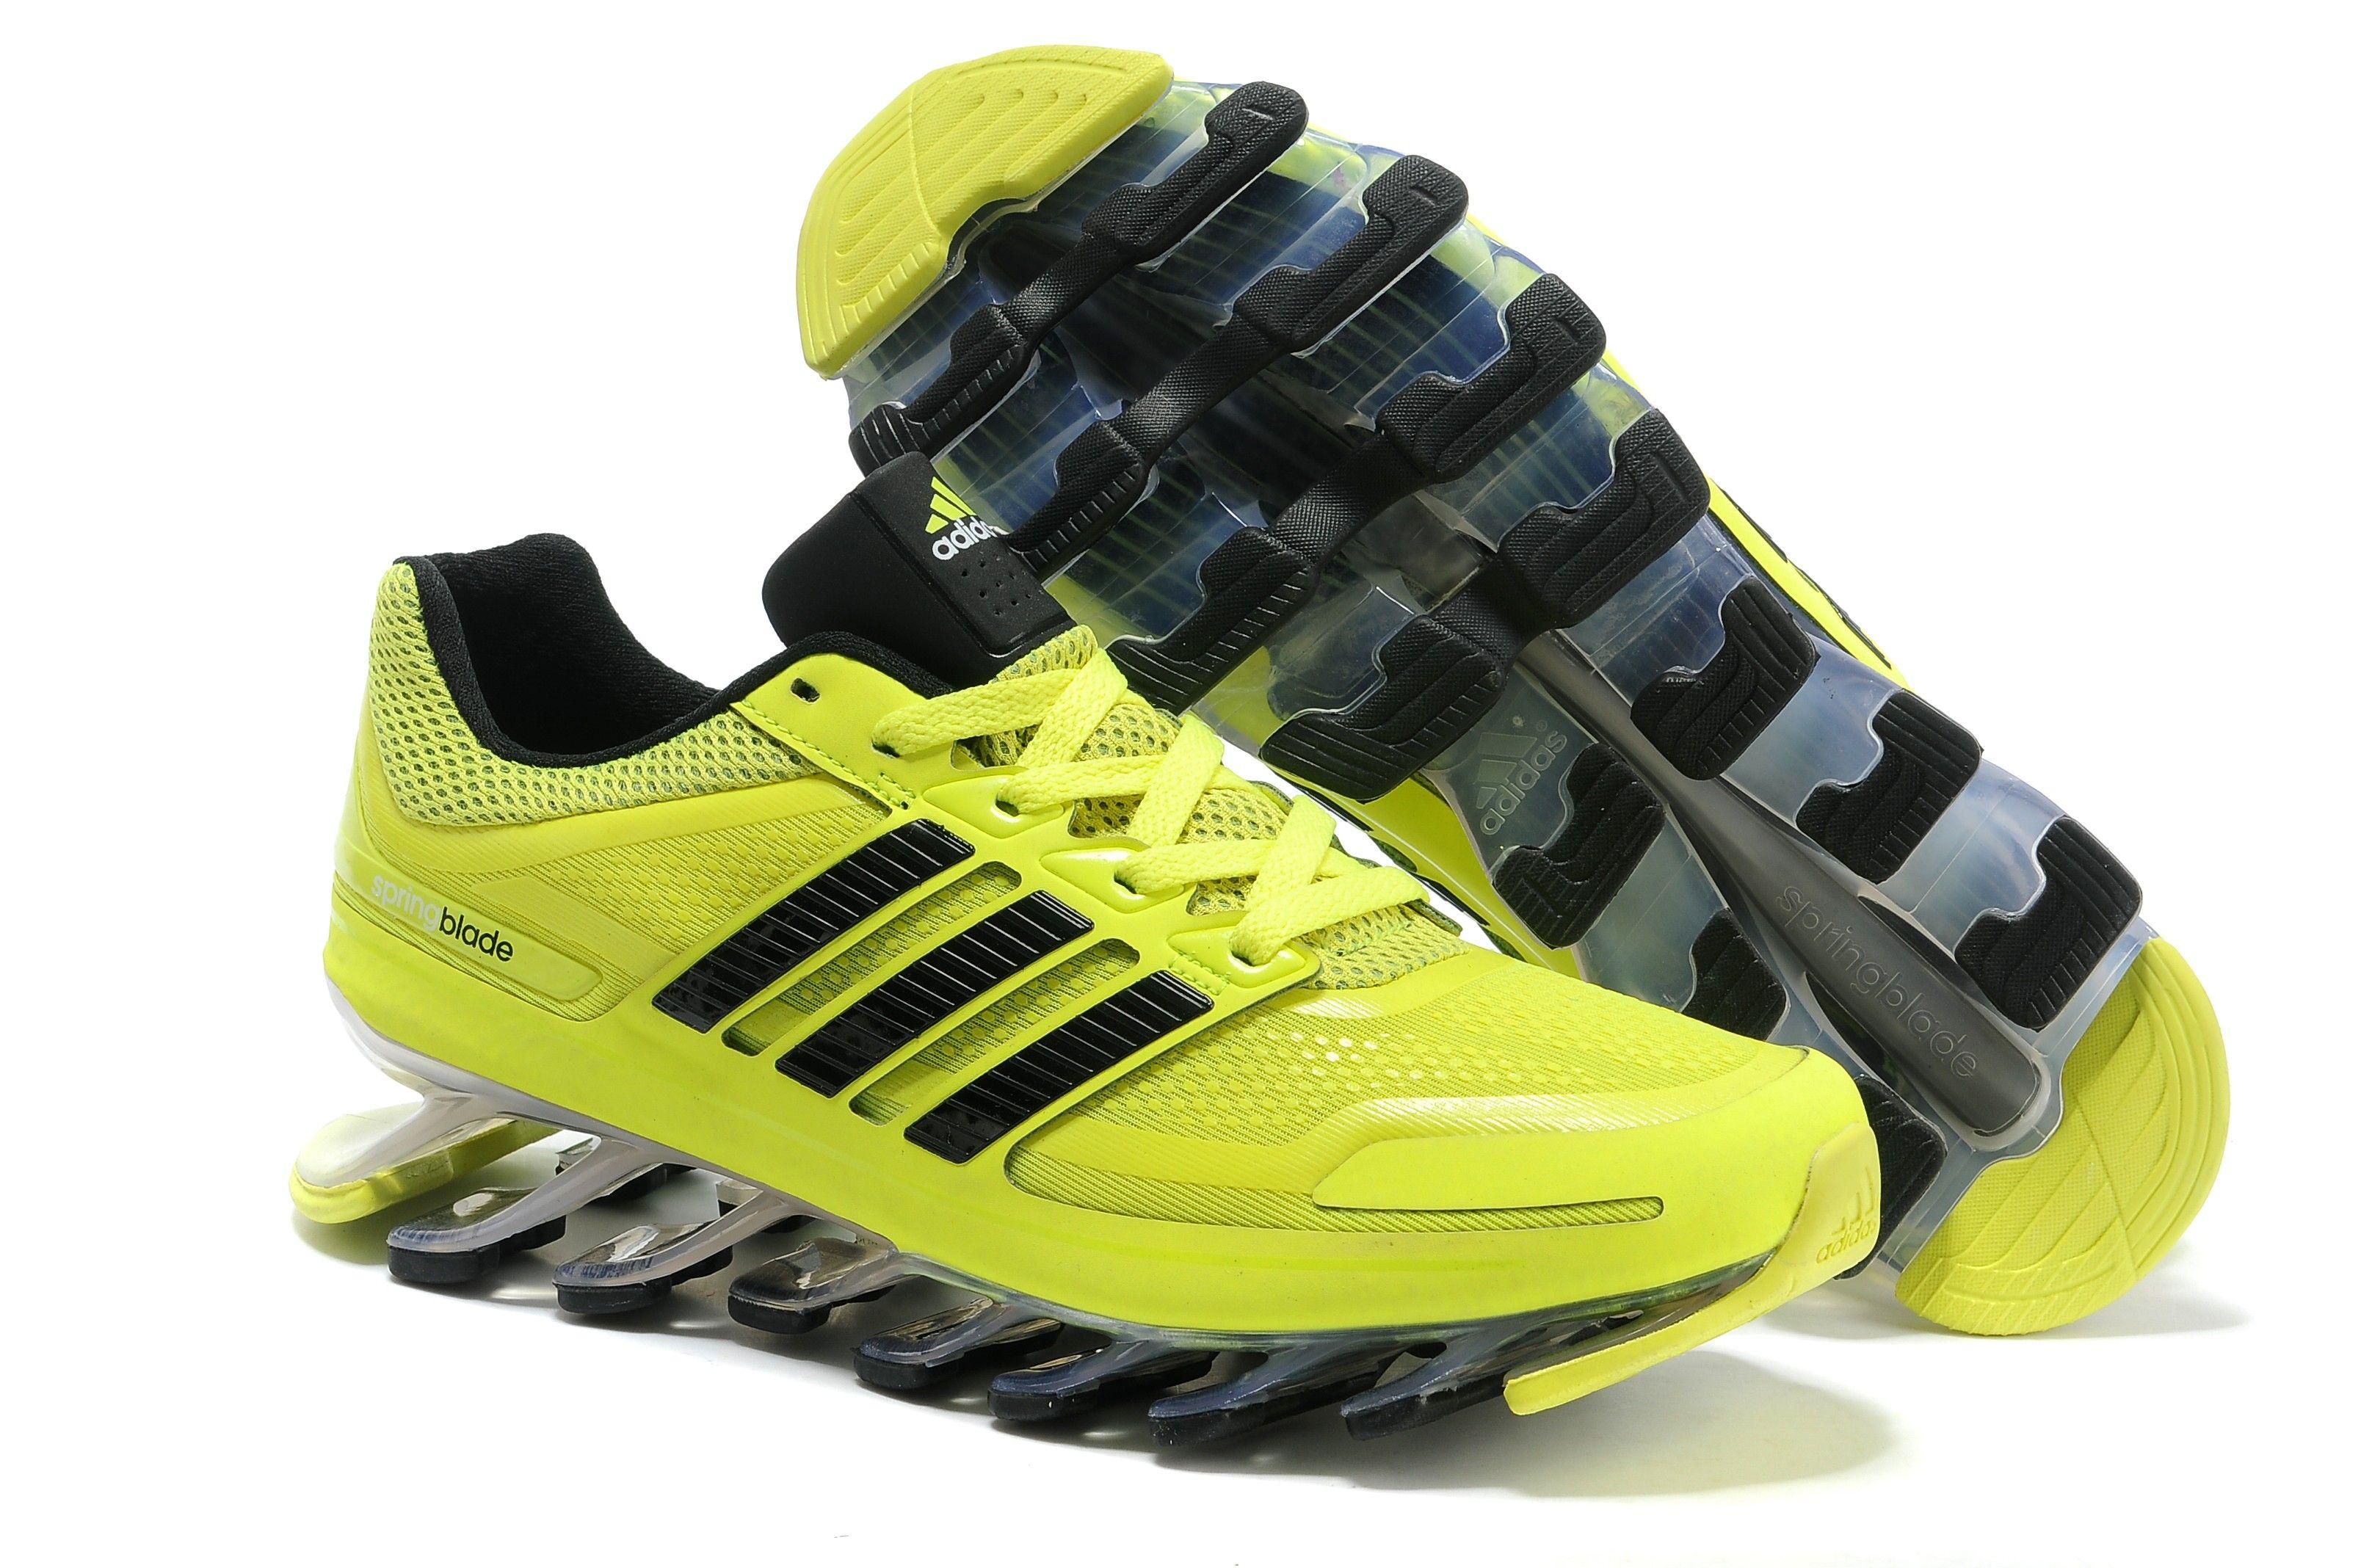 dc1e4e6be00b Discount Adidas Springblade Green Black Men s Athletics Running shoes  Online Shop